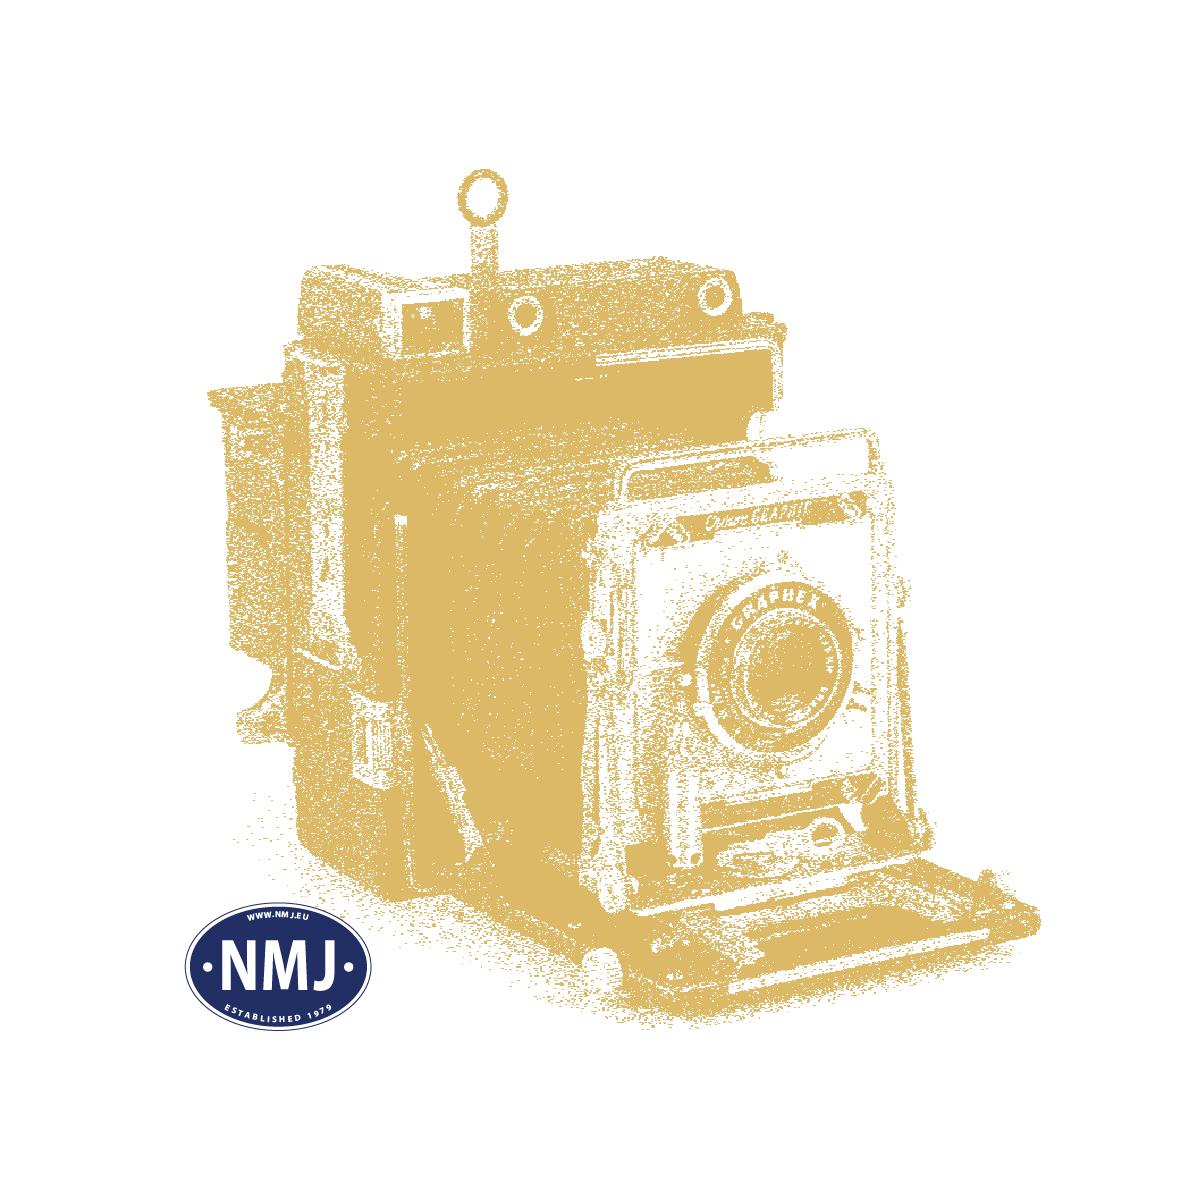 NMJT87.201 - NMJ Topline NSB El11b.2148, Redbrown, DC